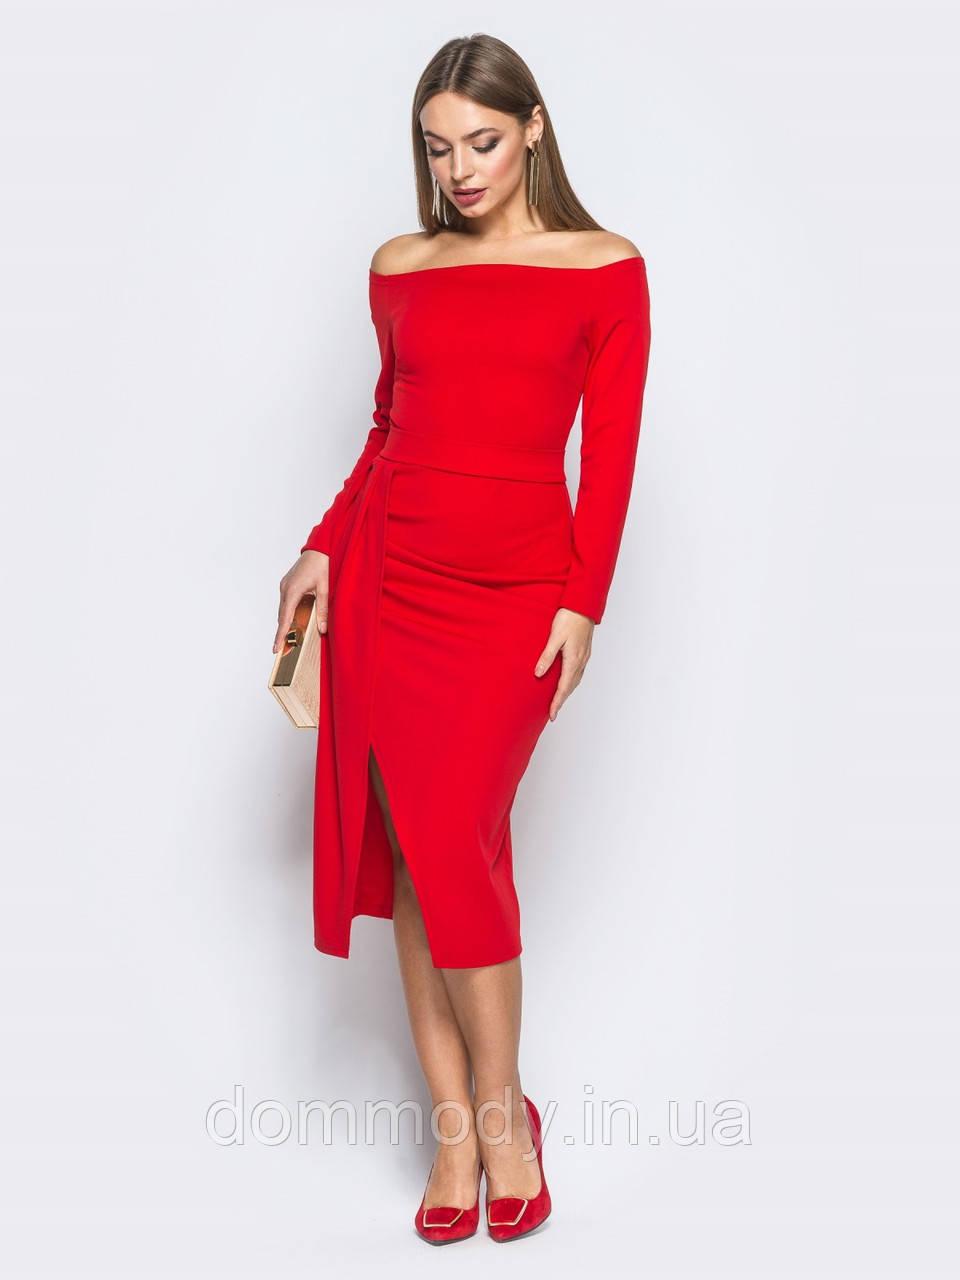 Платье женское Vivan red